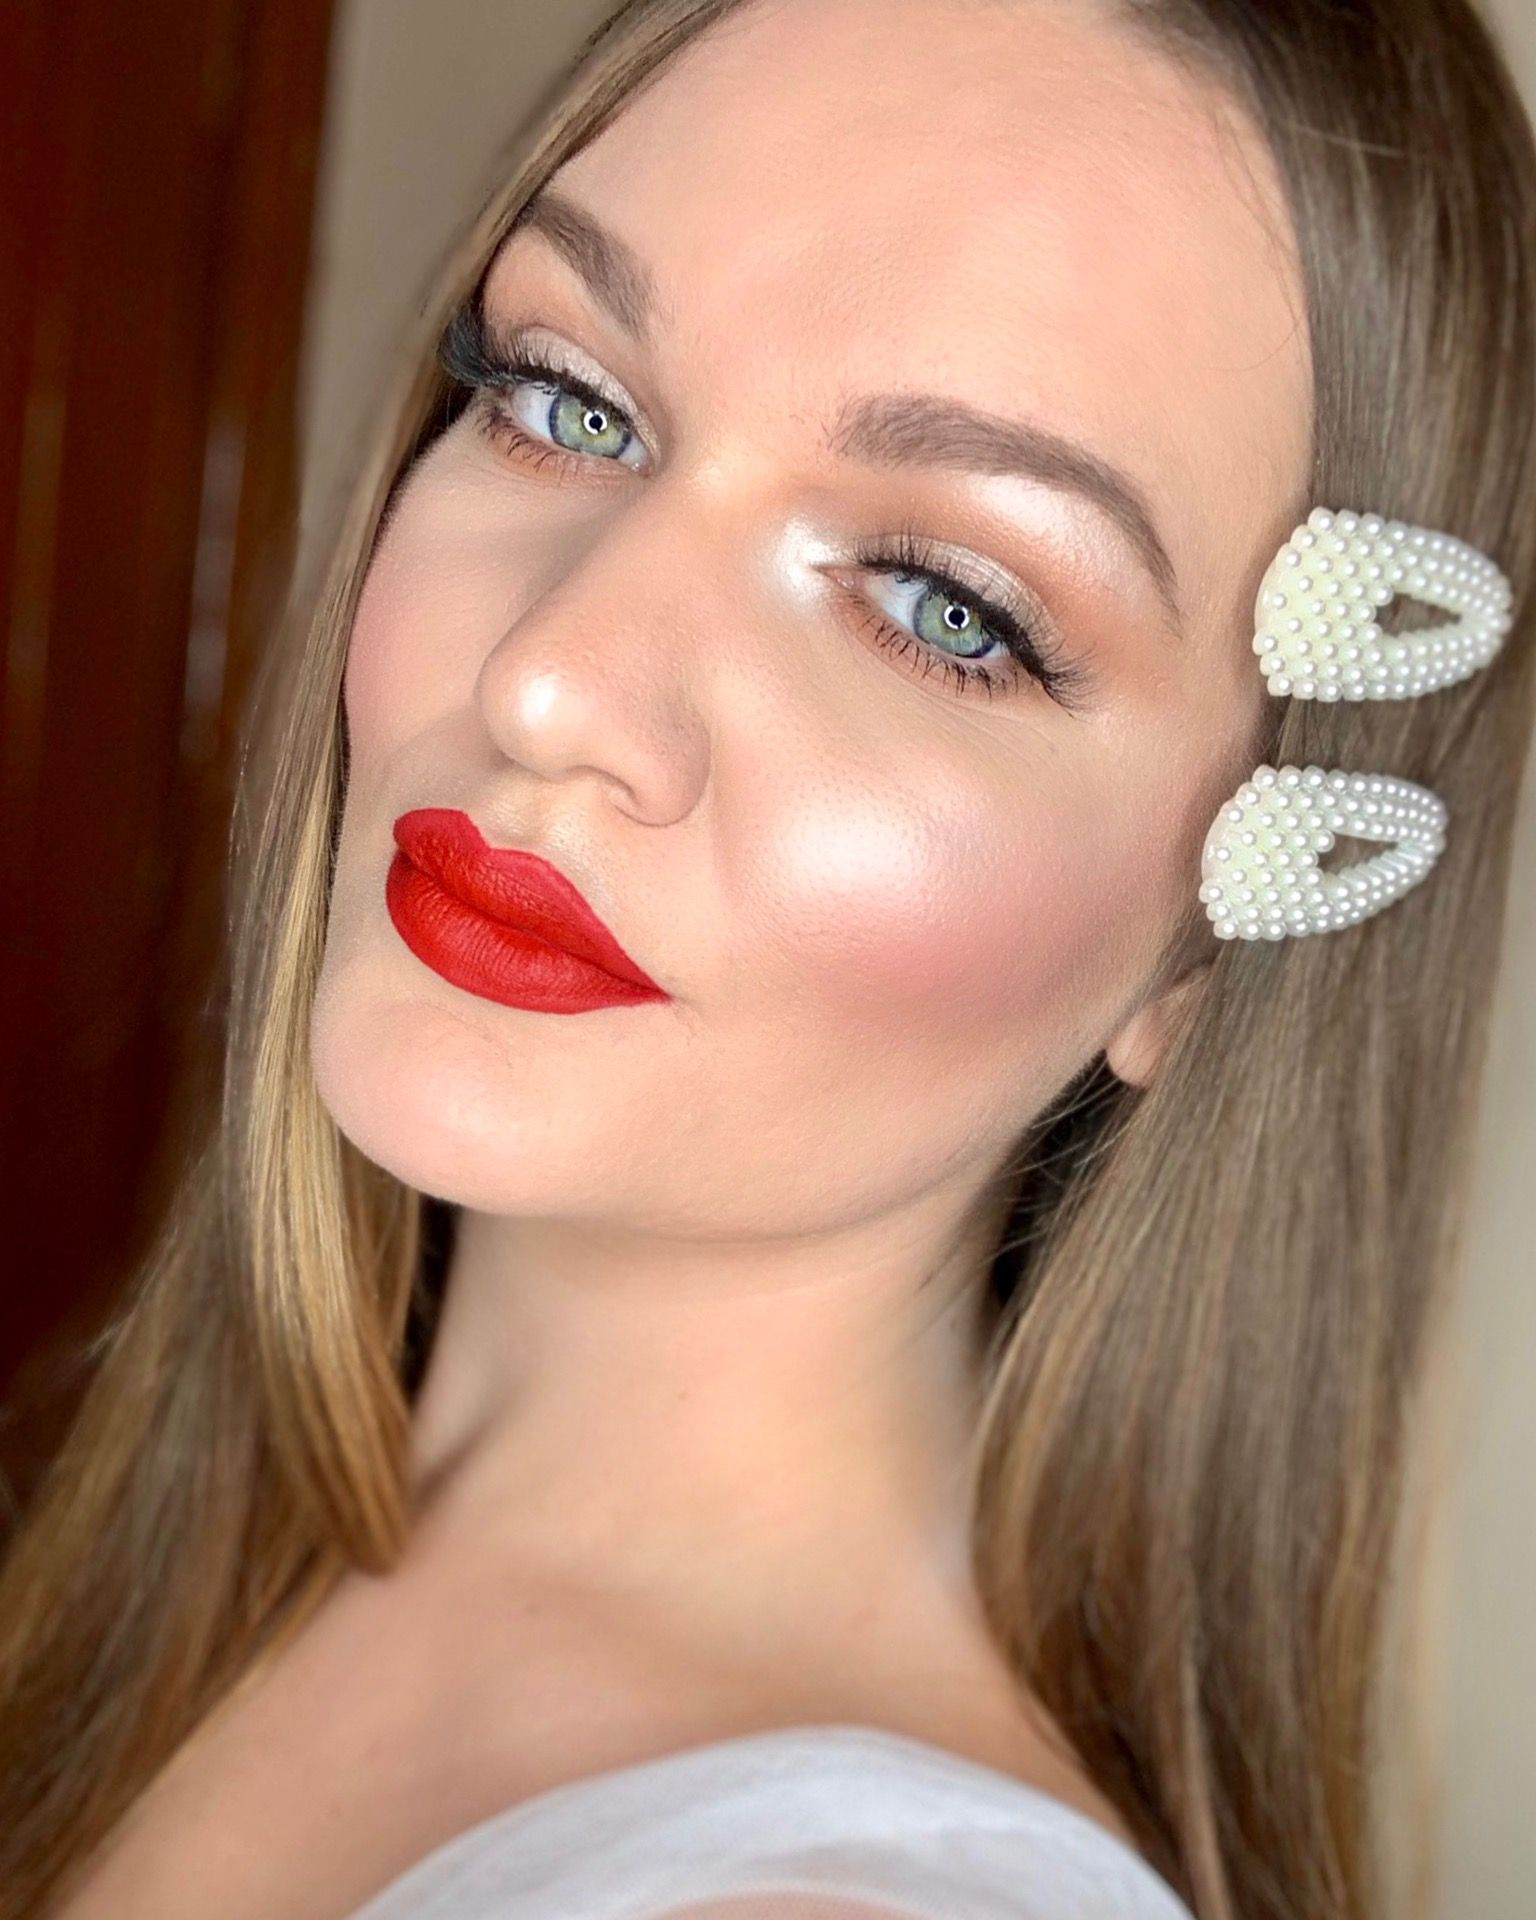 Glow makeup Glowing makeup, Makeup, Glowy makeup